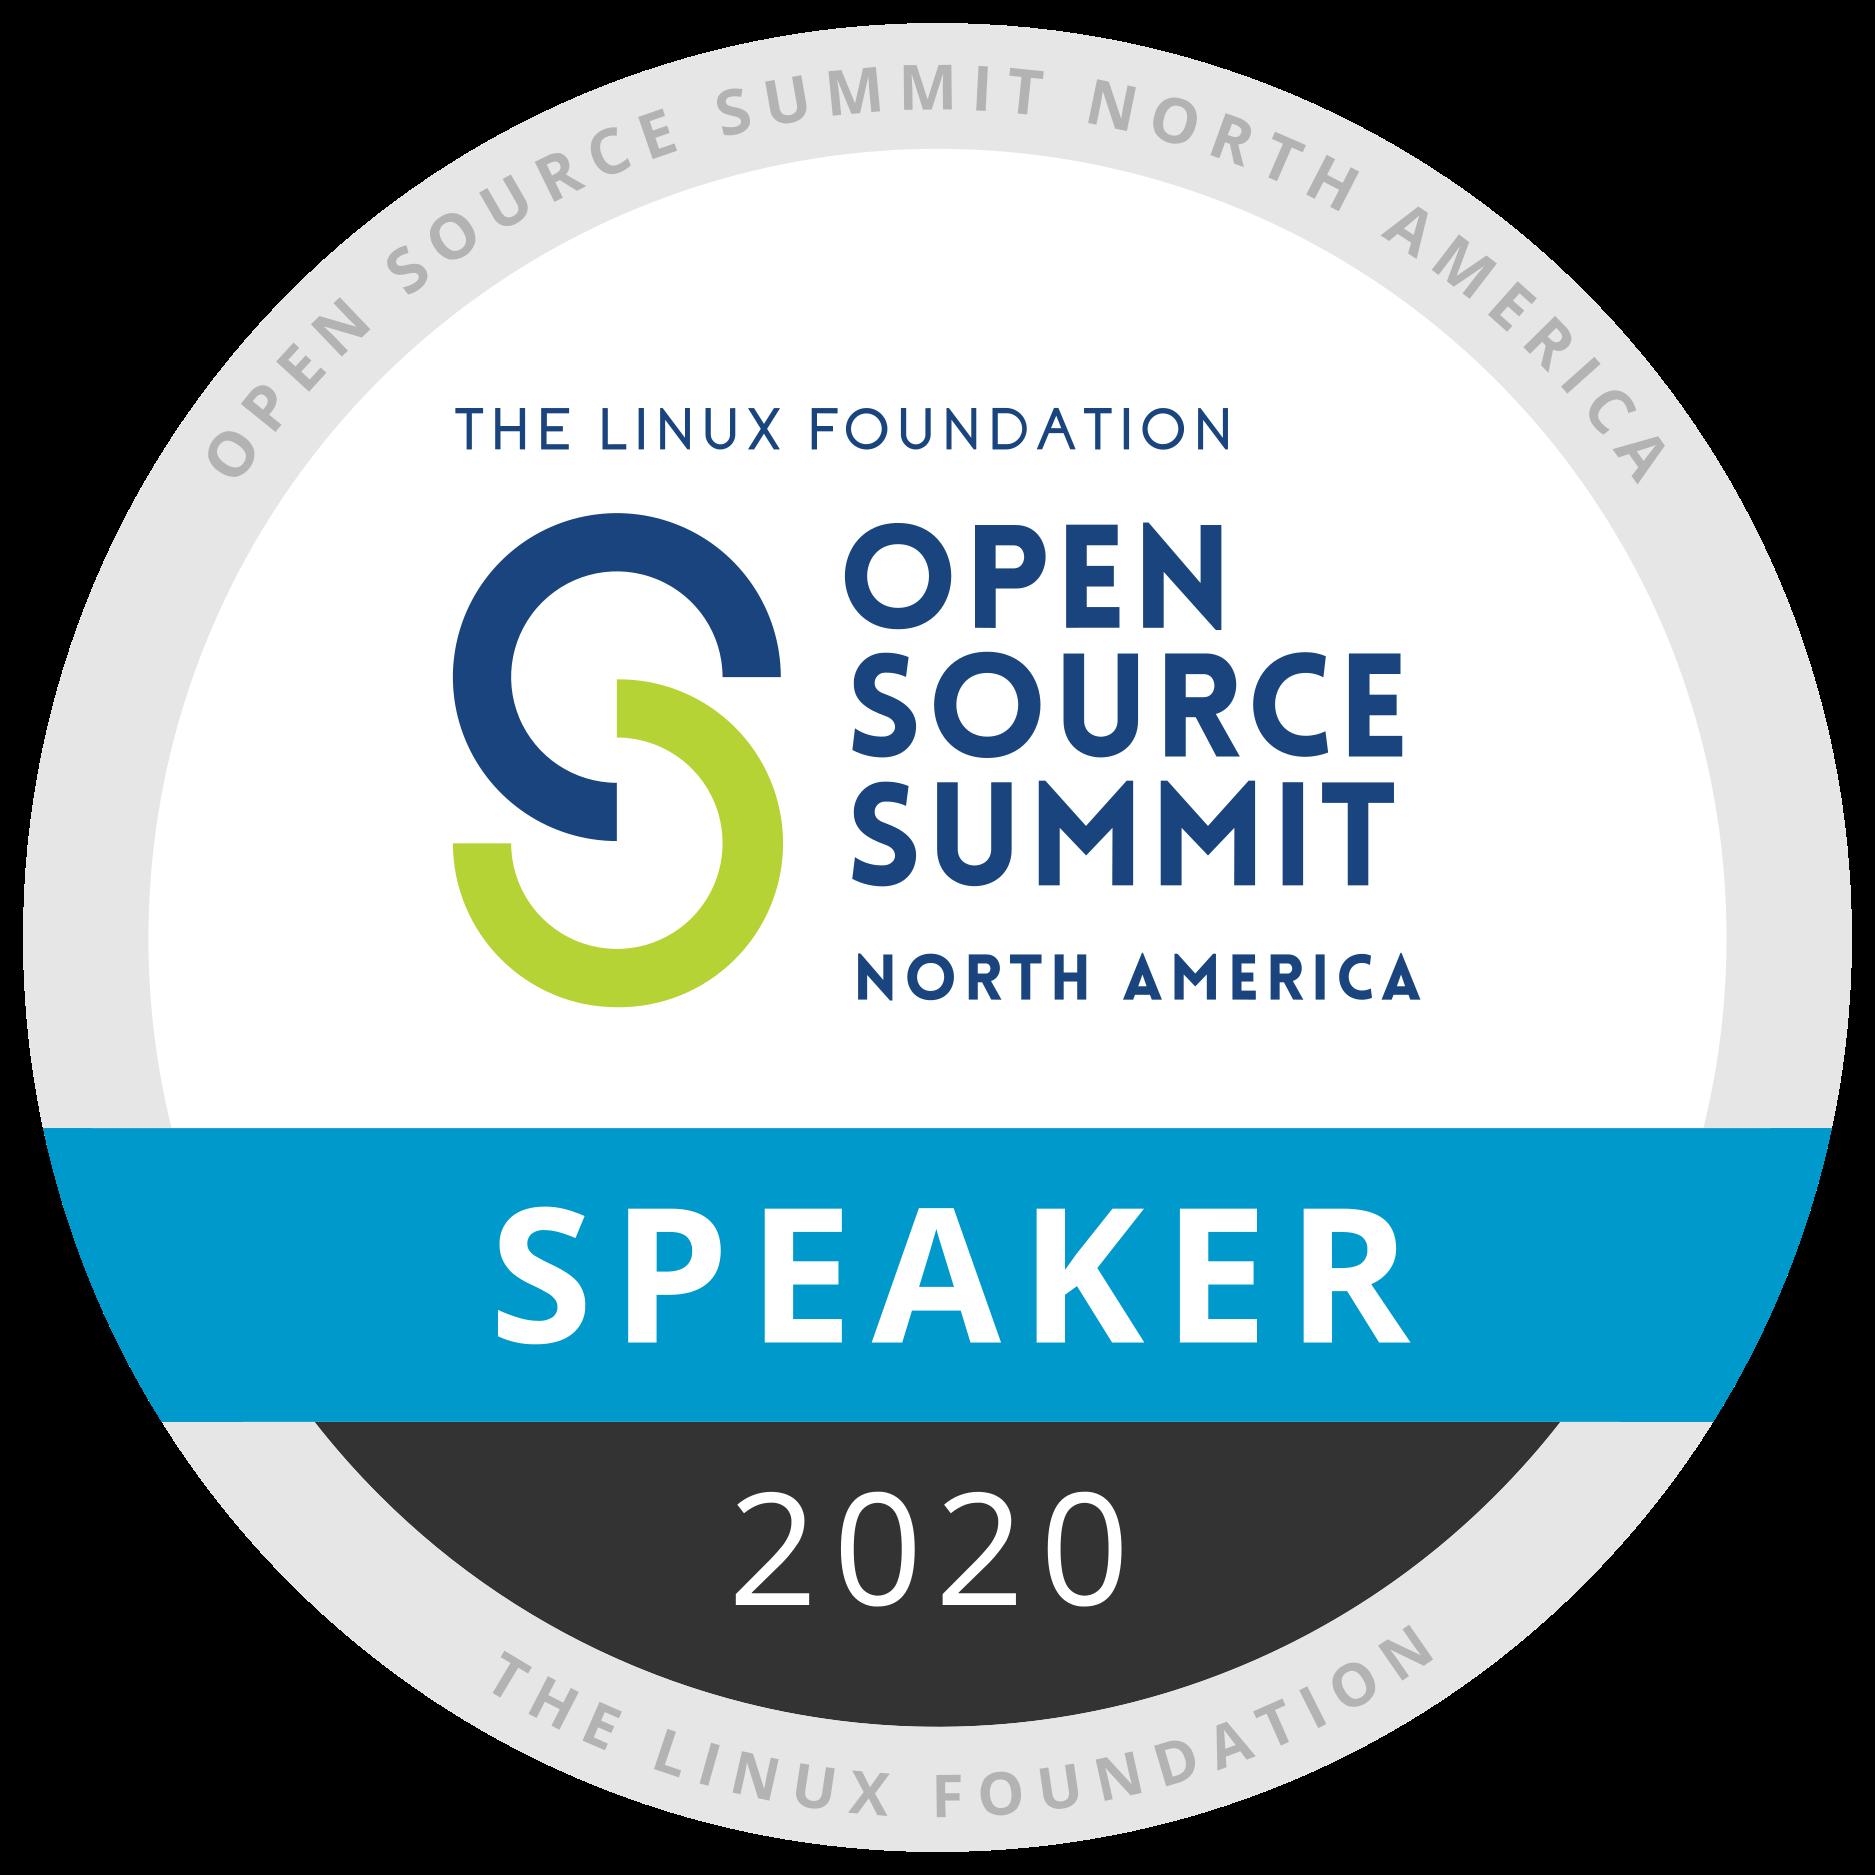 Speaker: Open Source Summit North America 2020